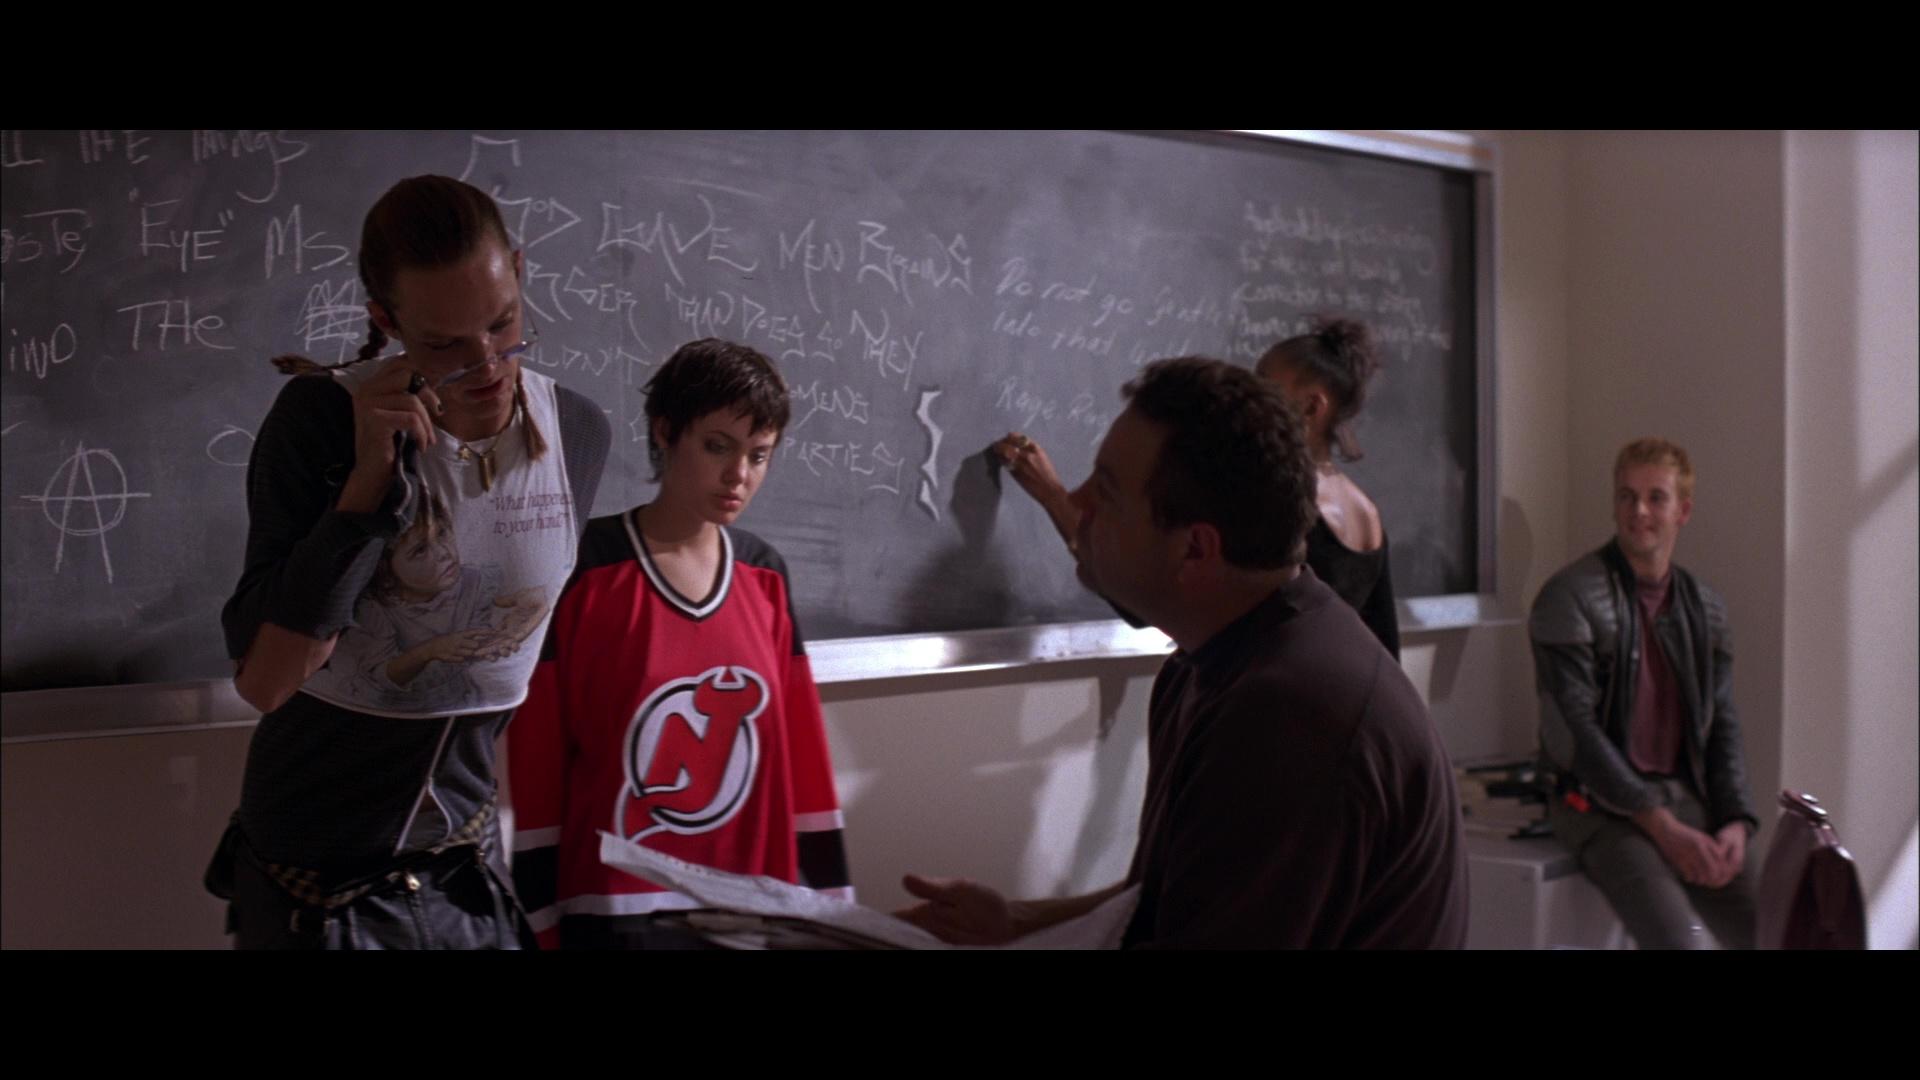 Famosetes que apoyen equipos de la NHL - Página 27 New-Jersey-Devils-T-Shirt-Worn-by-Angelina-Jolie-in-Hackers-2